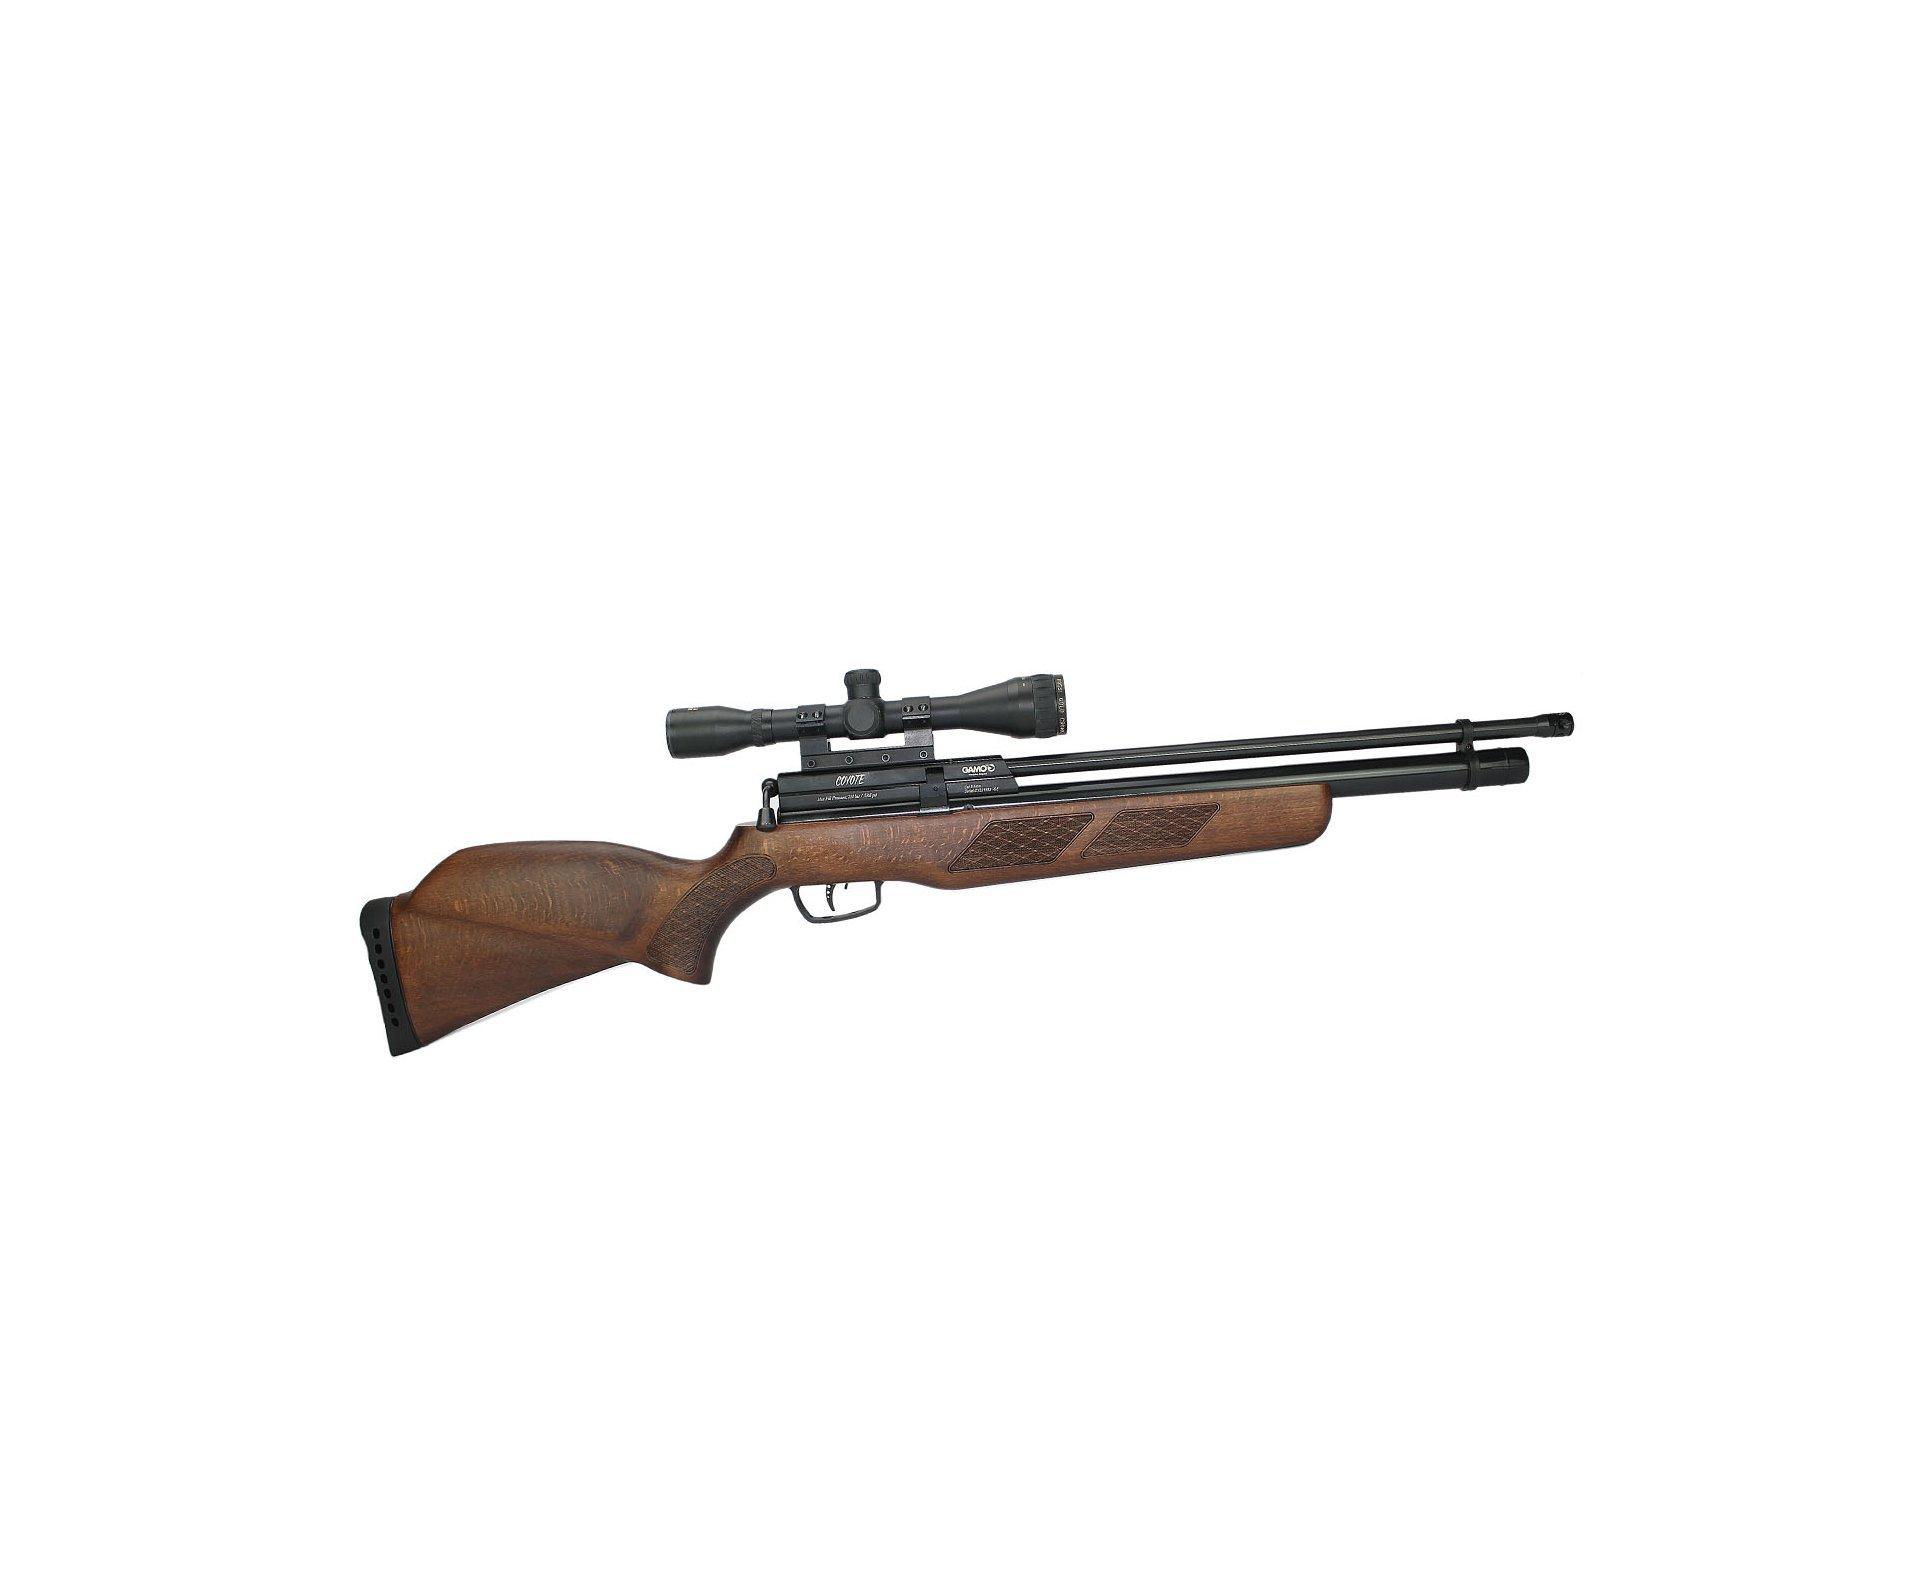 Carabina Pcp Gamo Coyote - Madeira Cal 5,5mm + Luneta 4x32 Gold Crow Rossi + Bomba Hand Pump Inox - Gamo